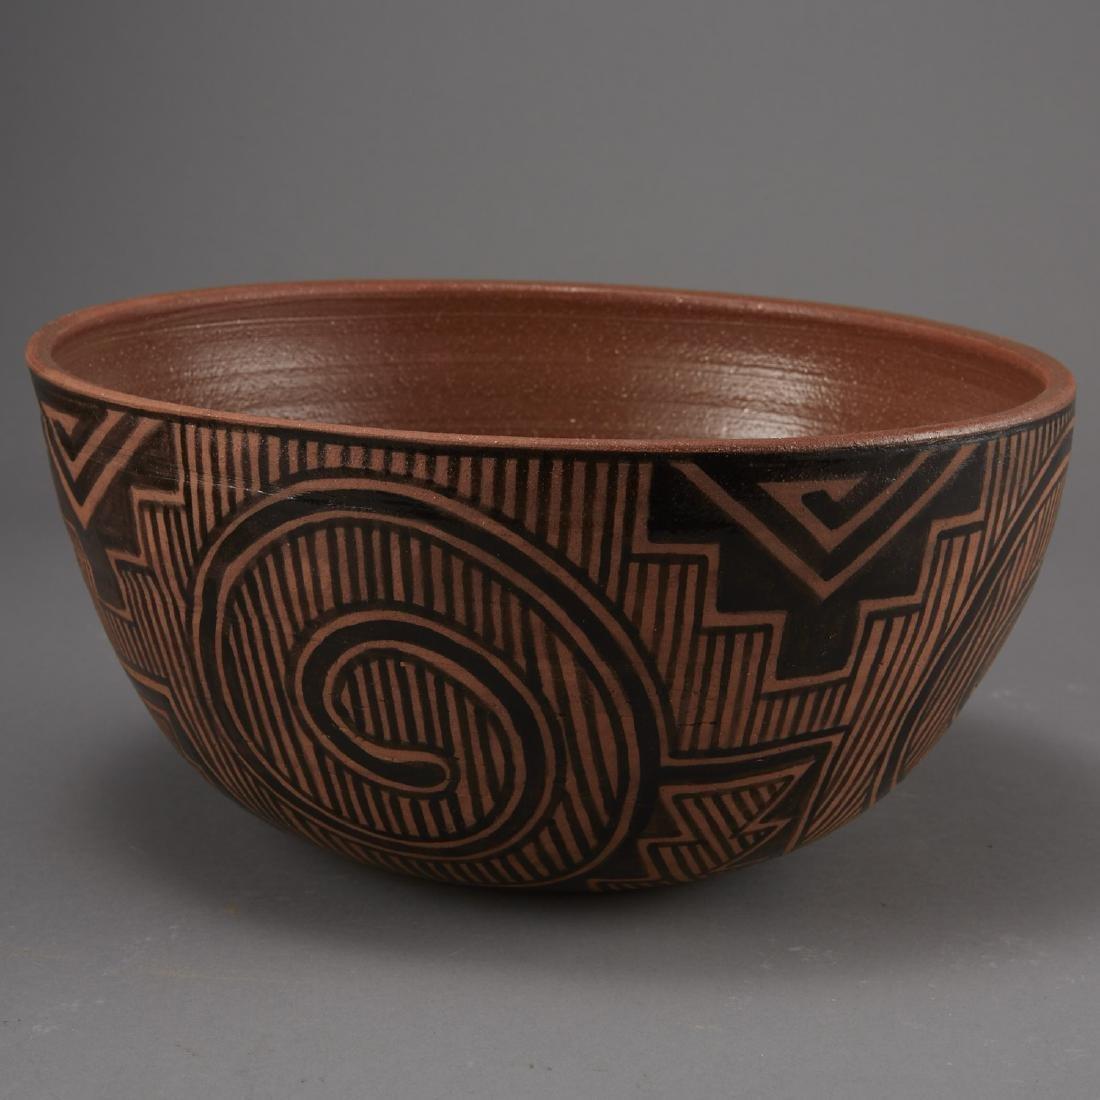 6 Pueblo Pottery Pots incld Fragua, Nez, Medina - 5